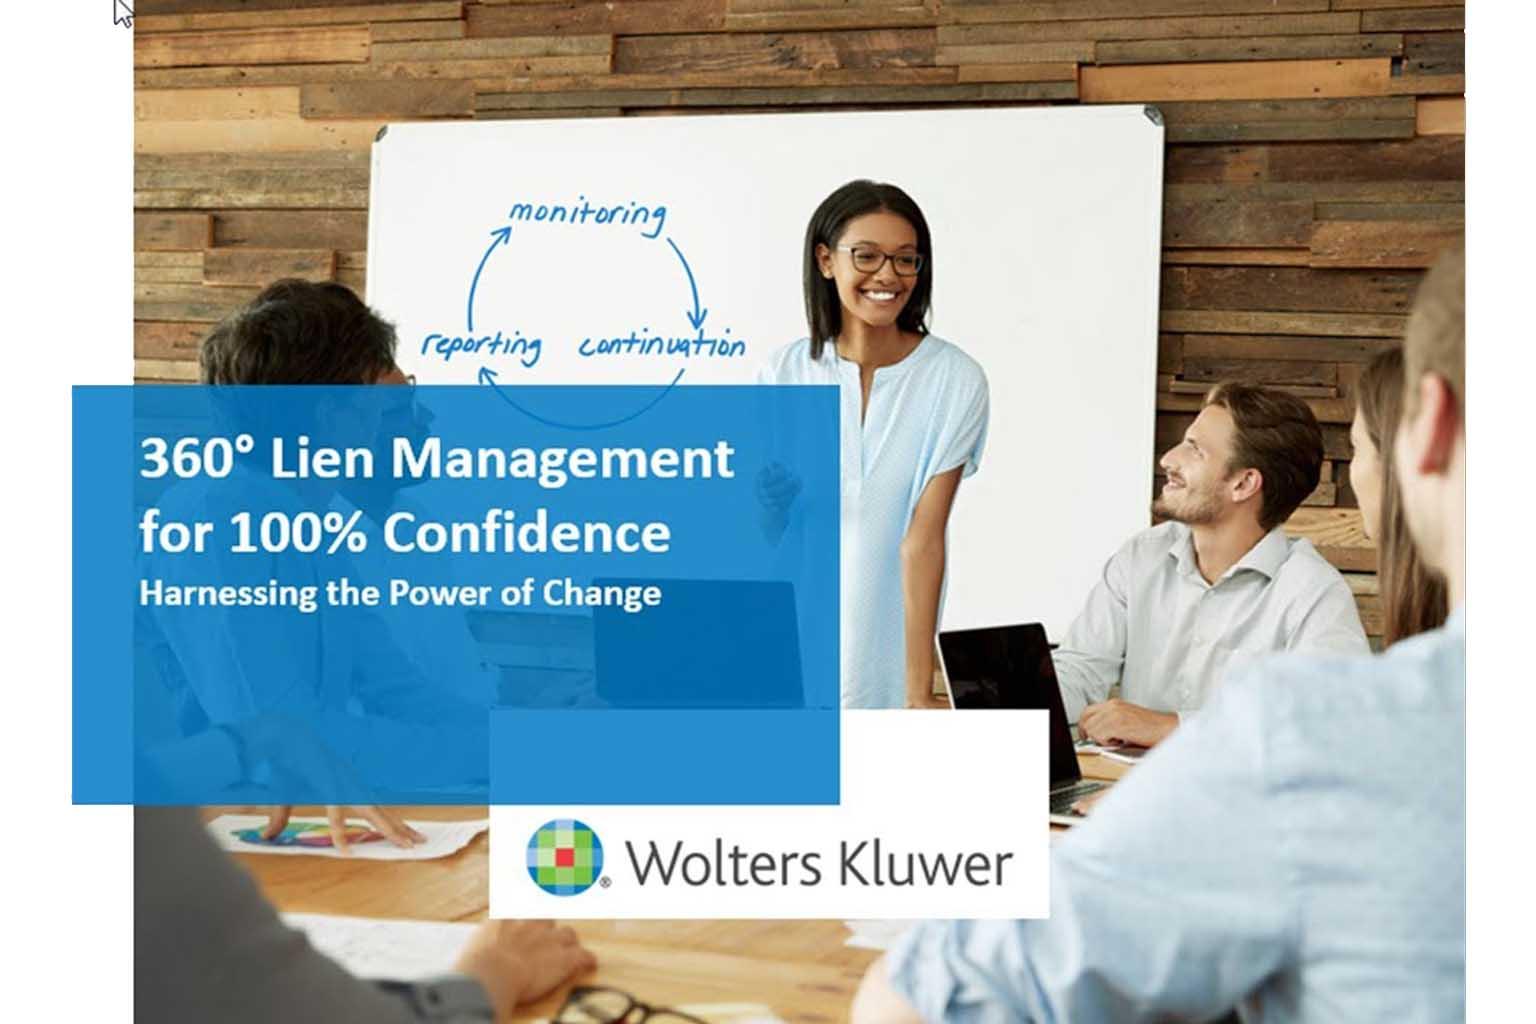 Lien Management for 100% Confidence webinar title card